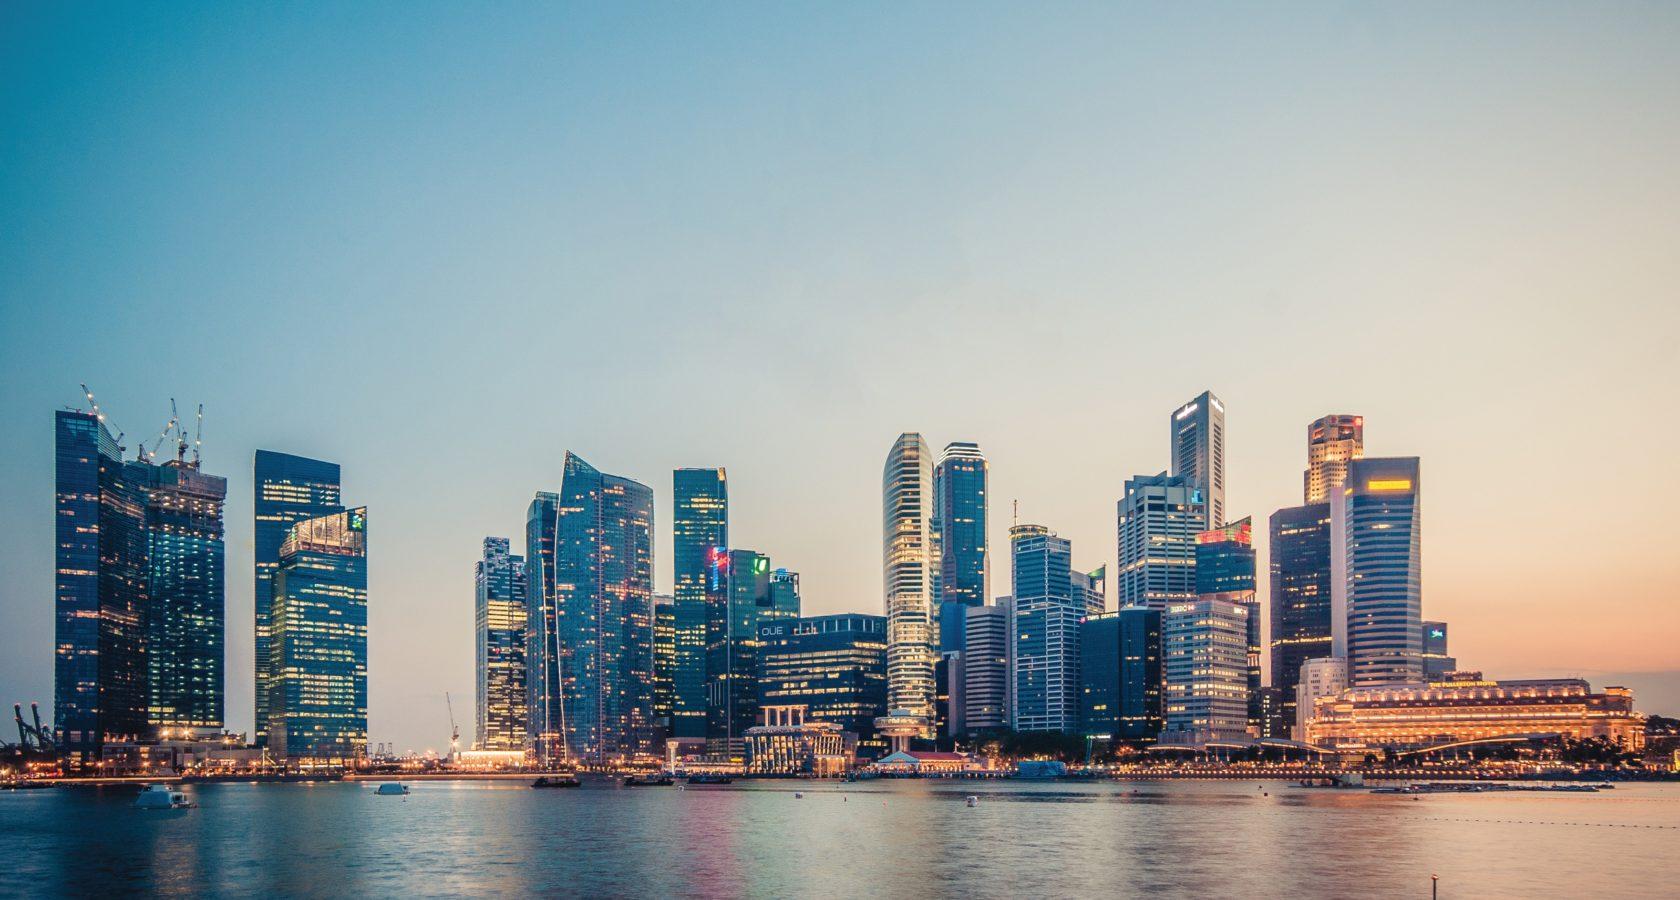 peter-nguyen-128482-unsplash_singapur